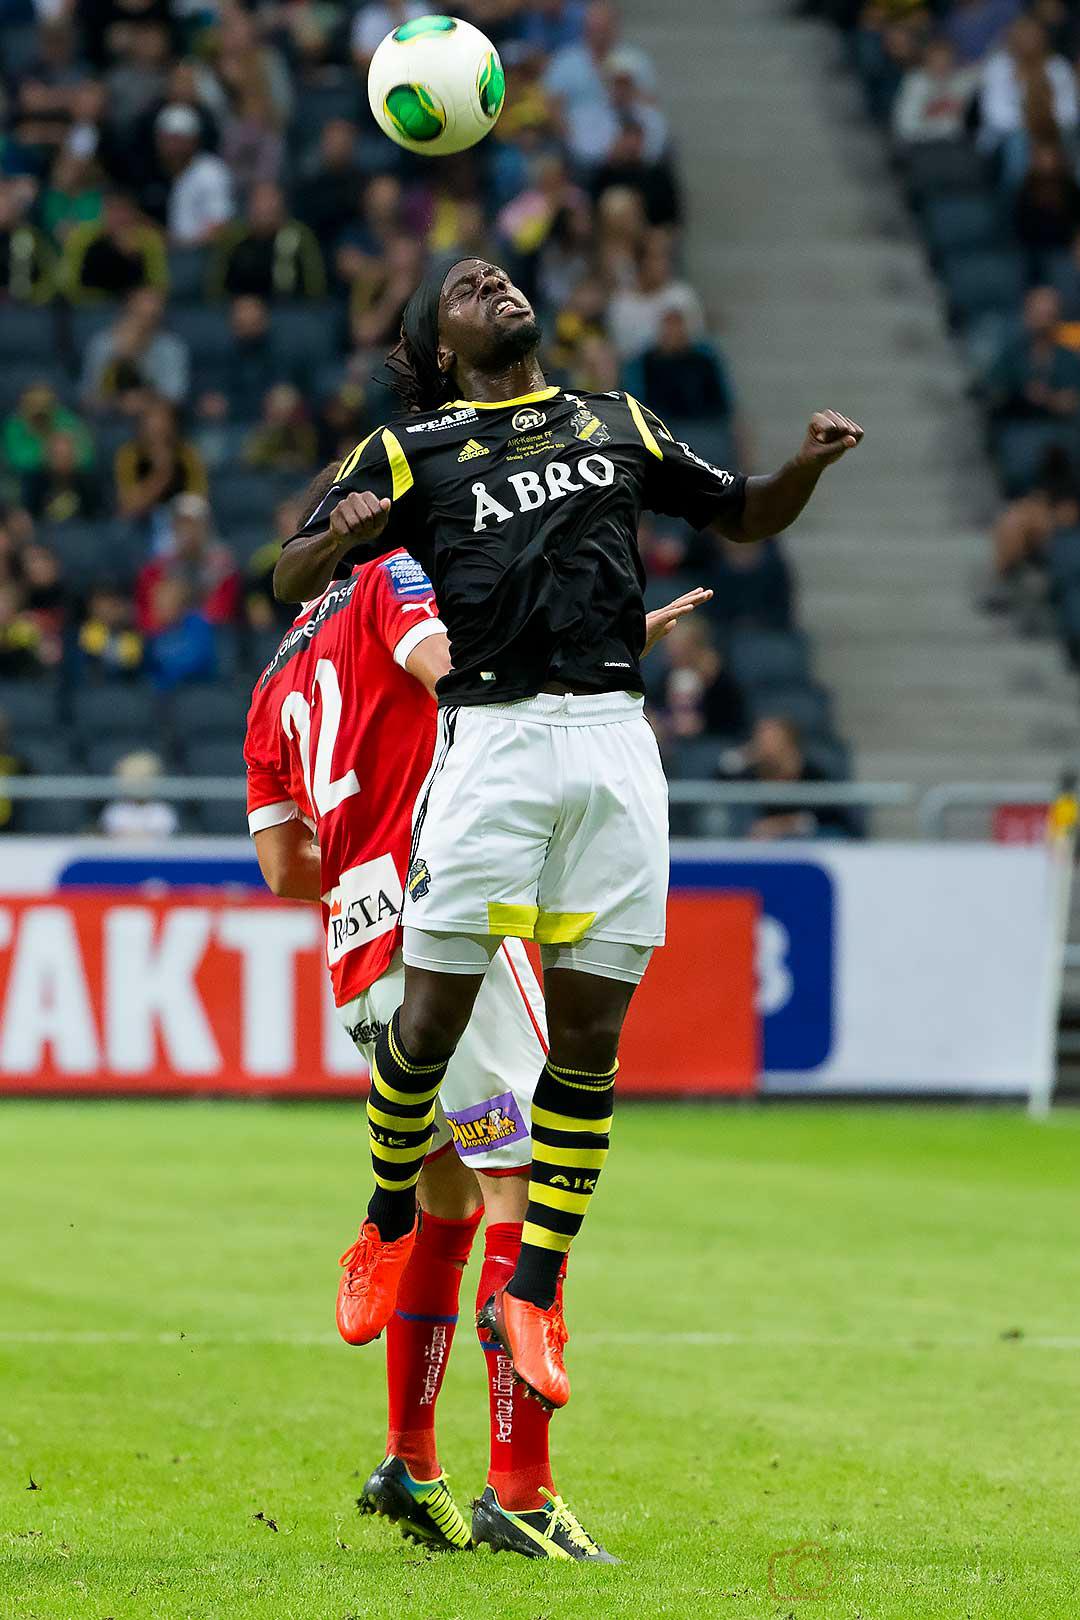 AIK Martin Mutumba